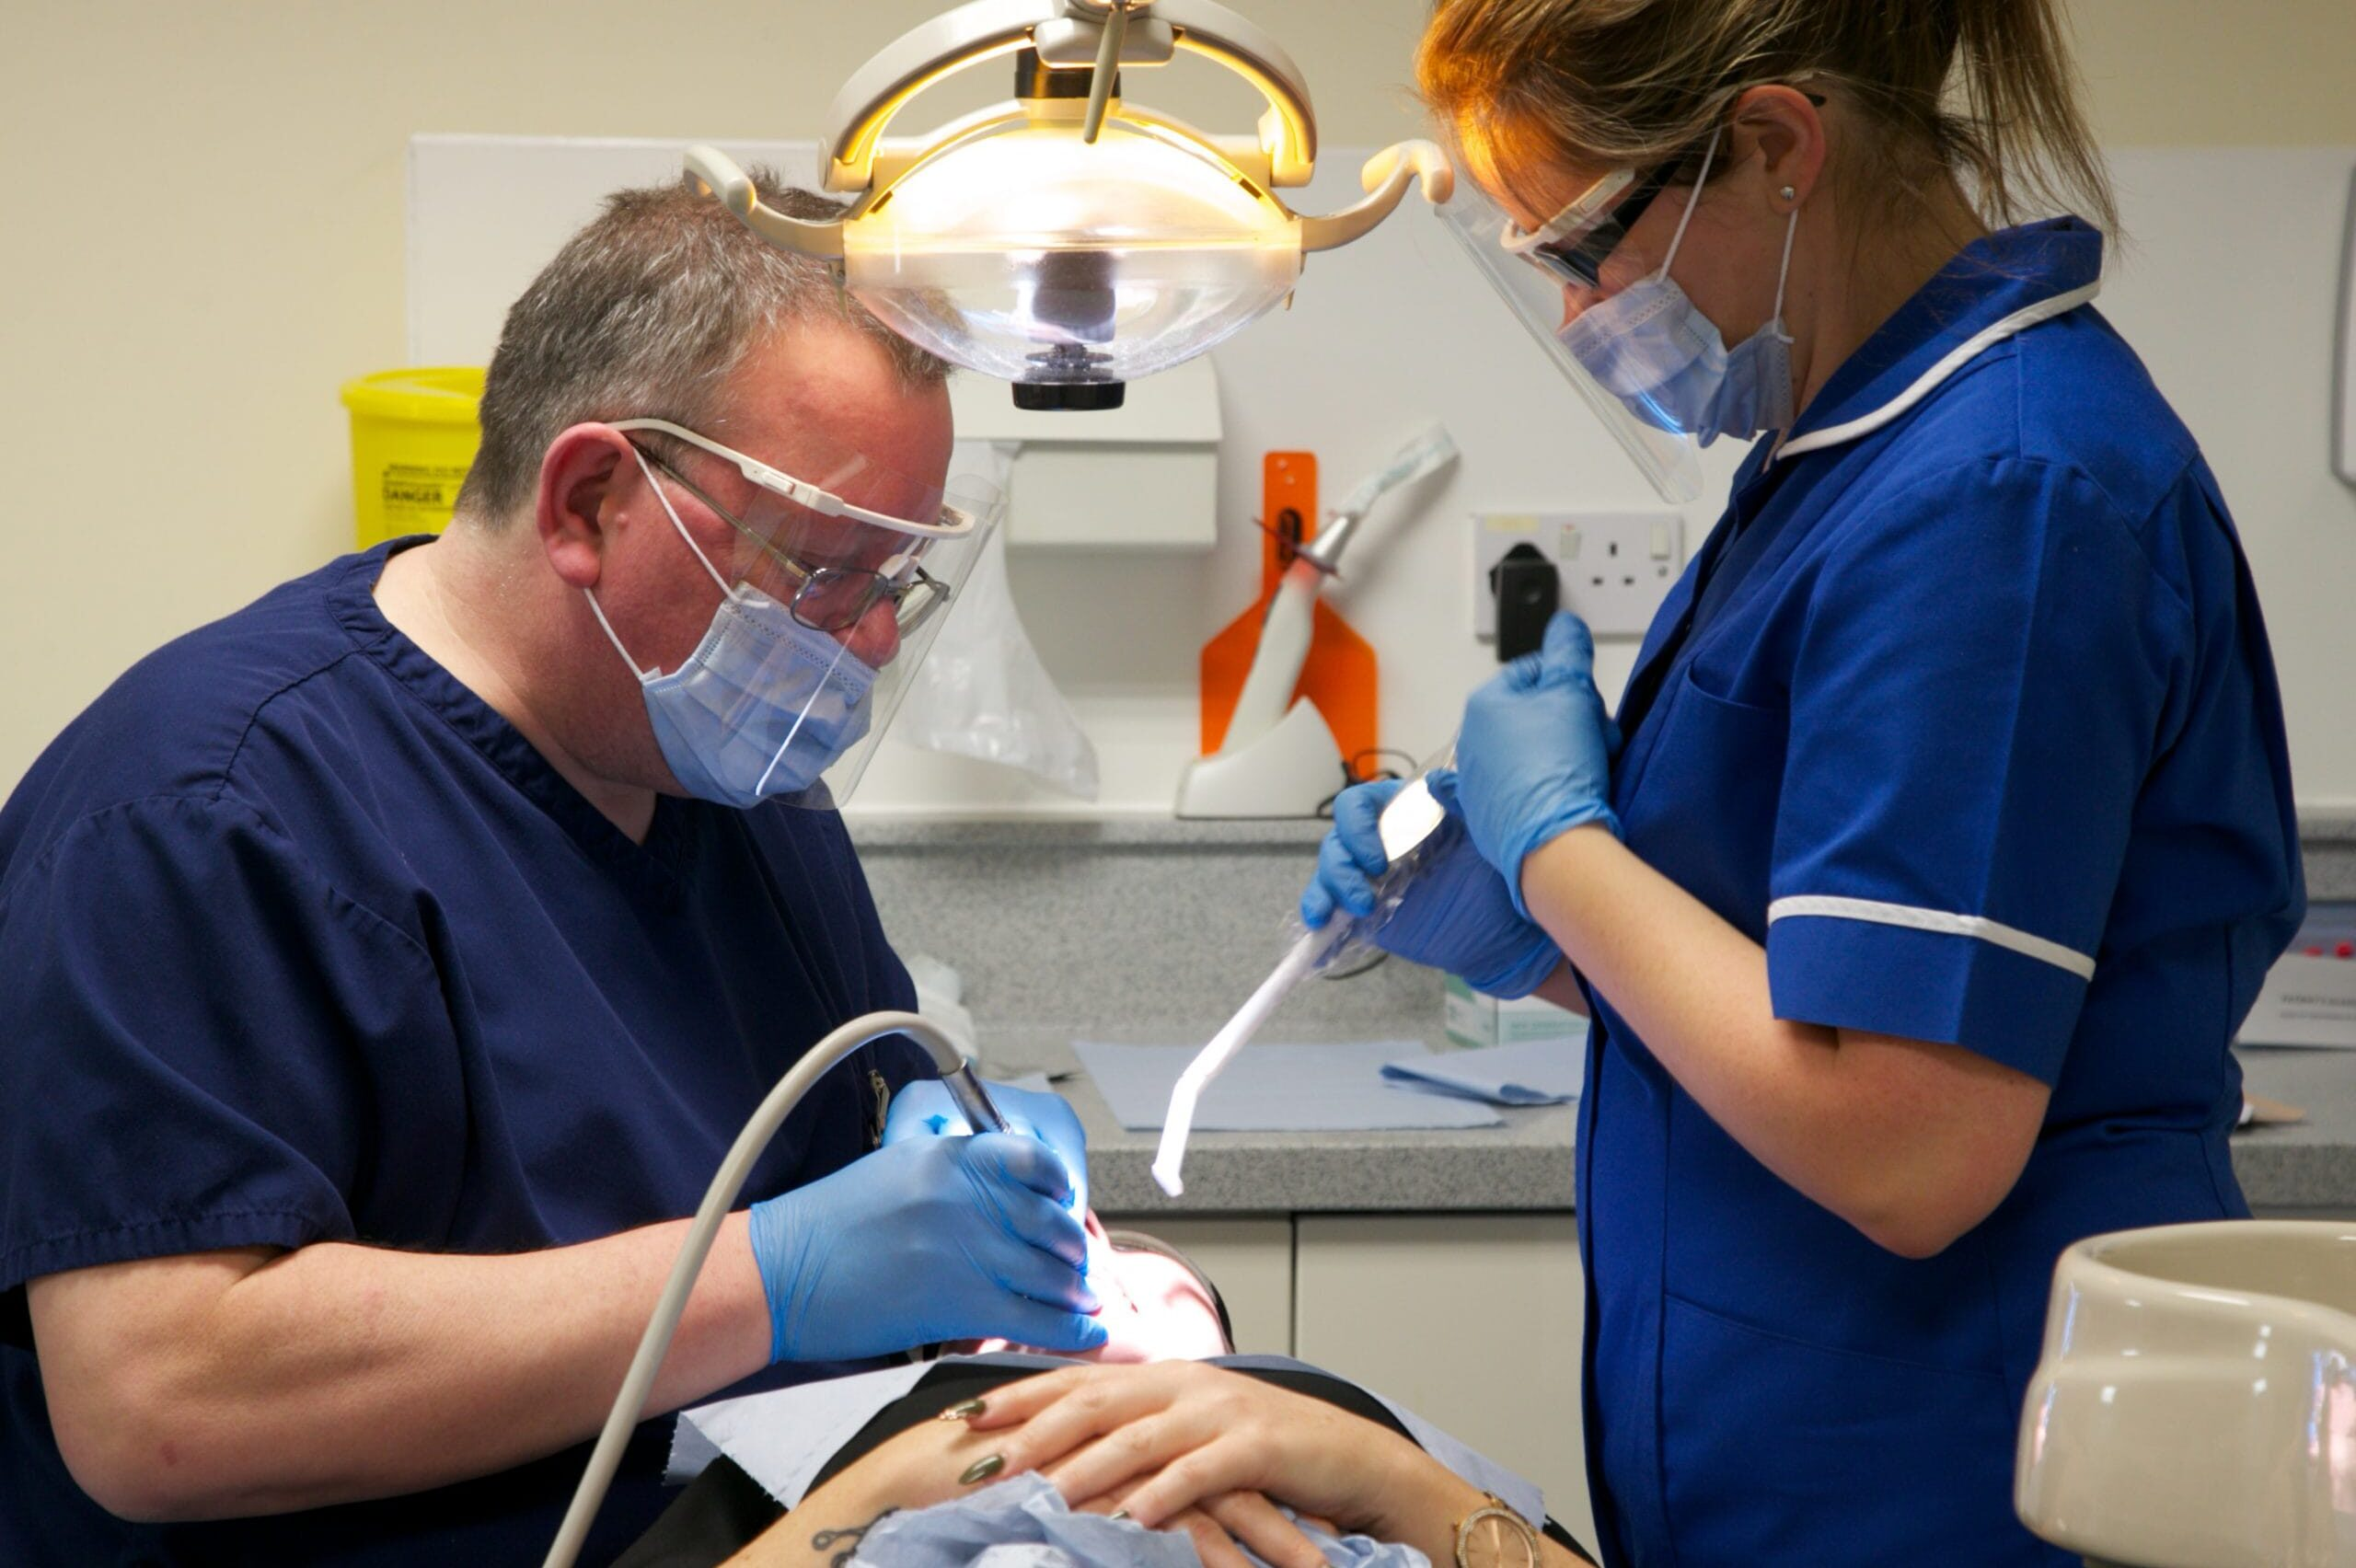 Dentist and dental nurse